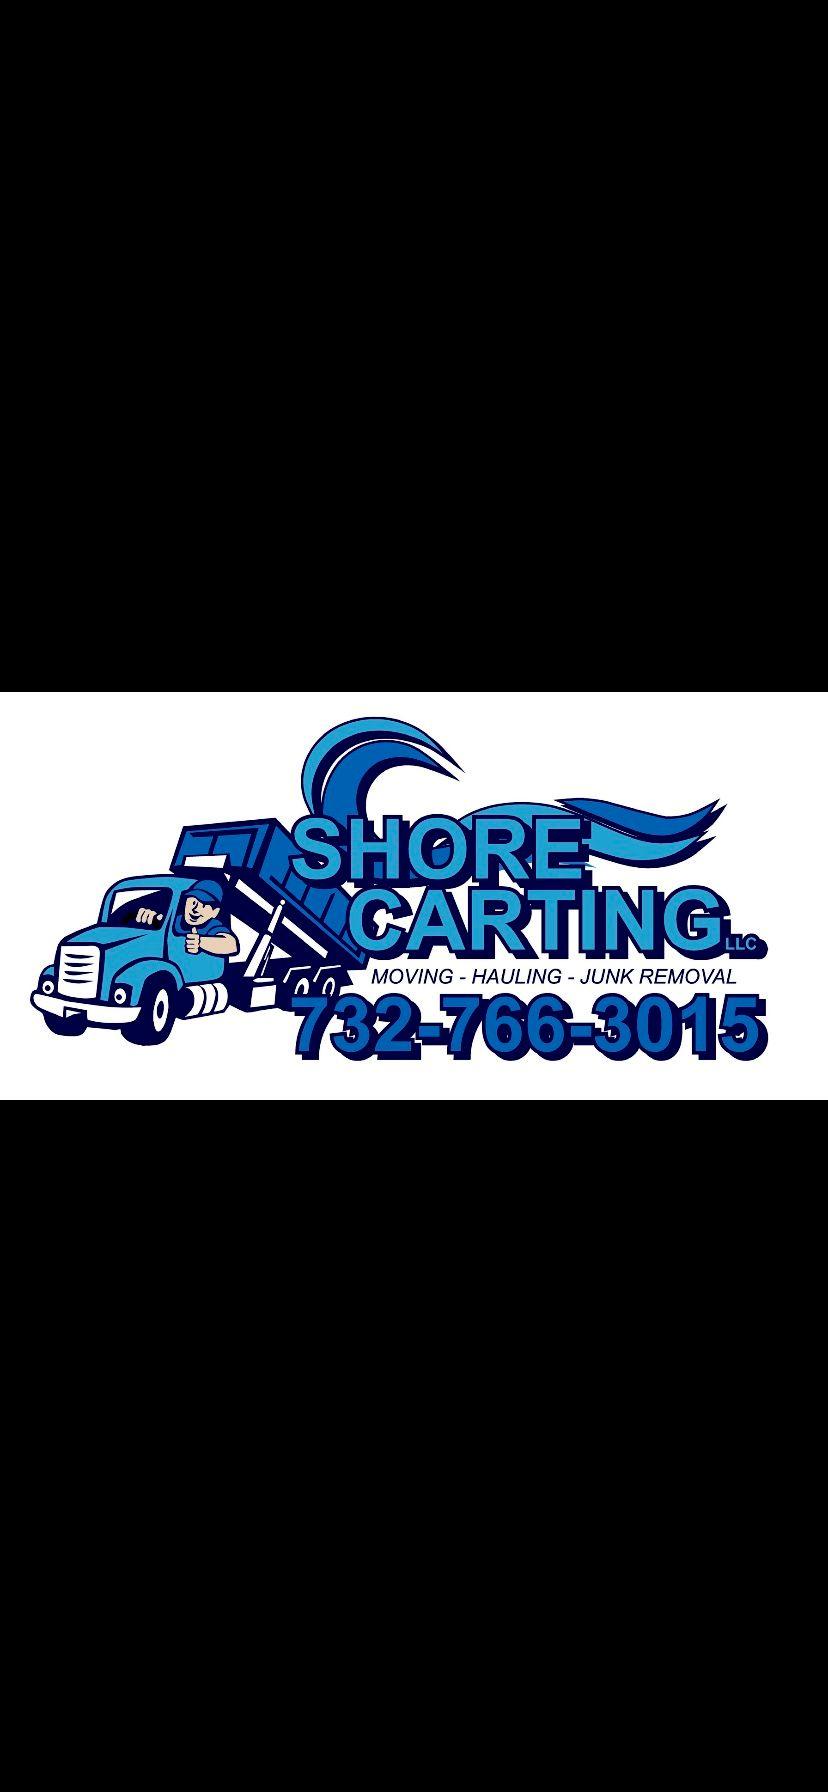 SHORE CARTING LLC